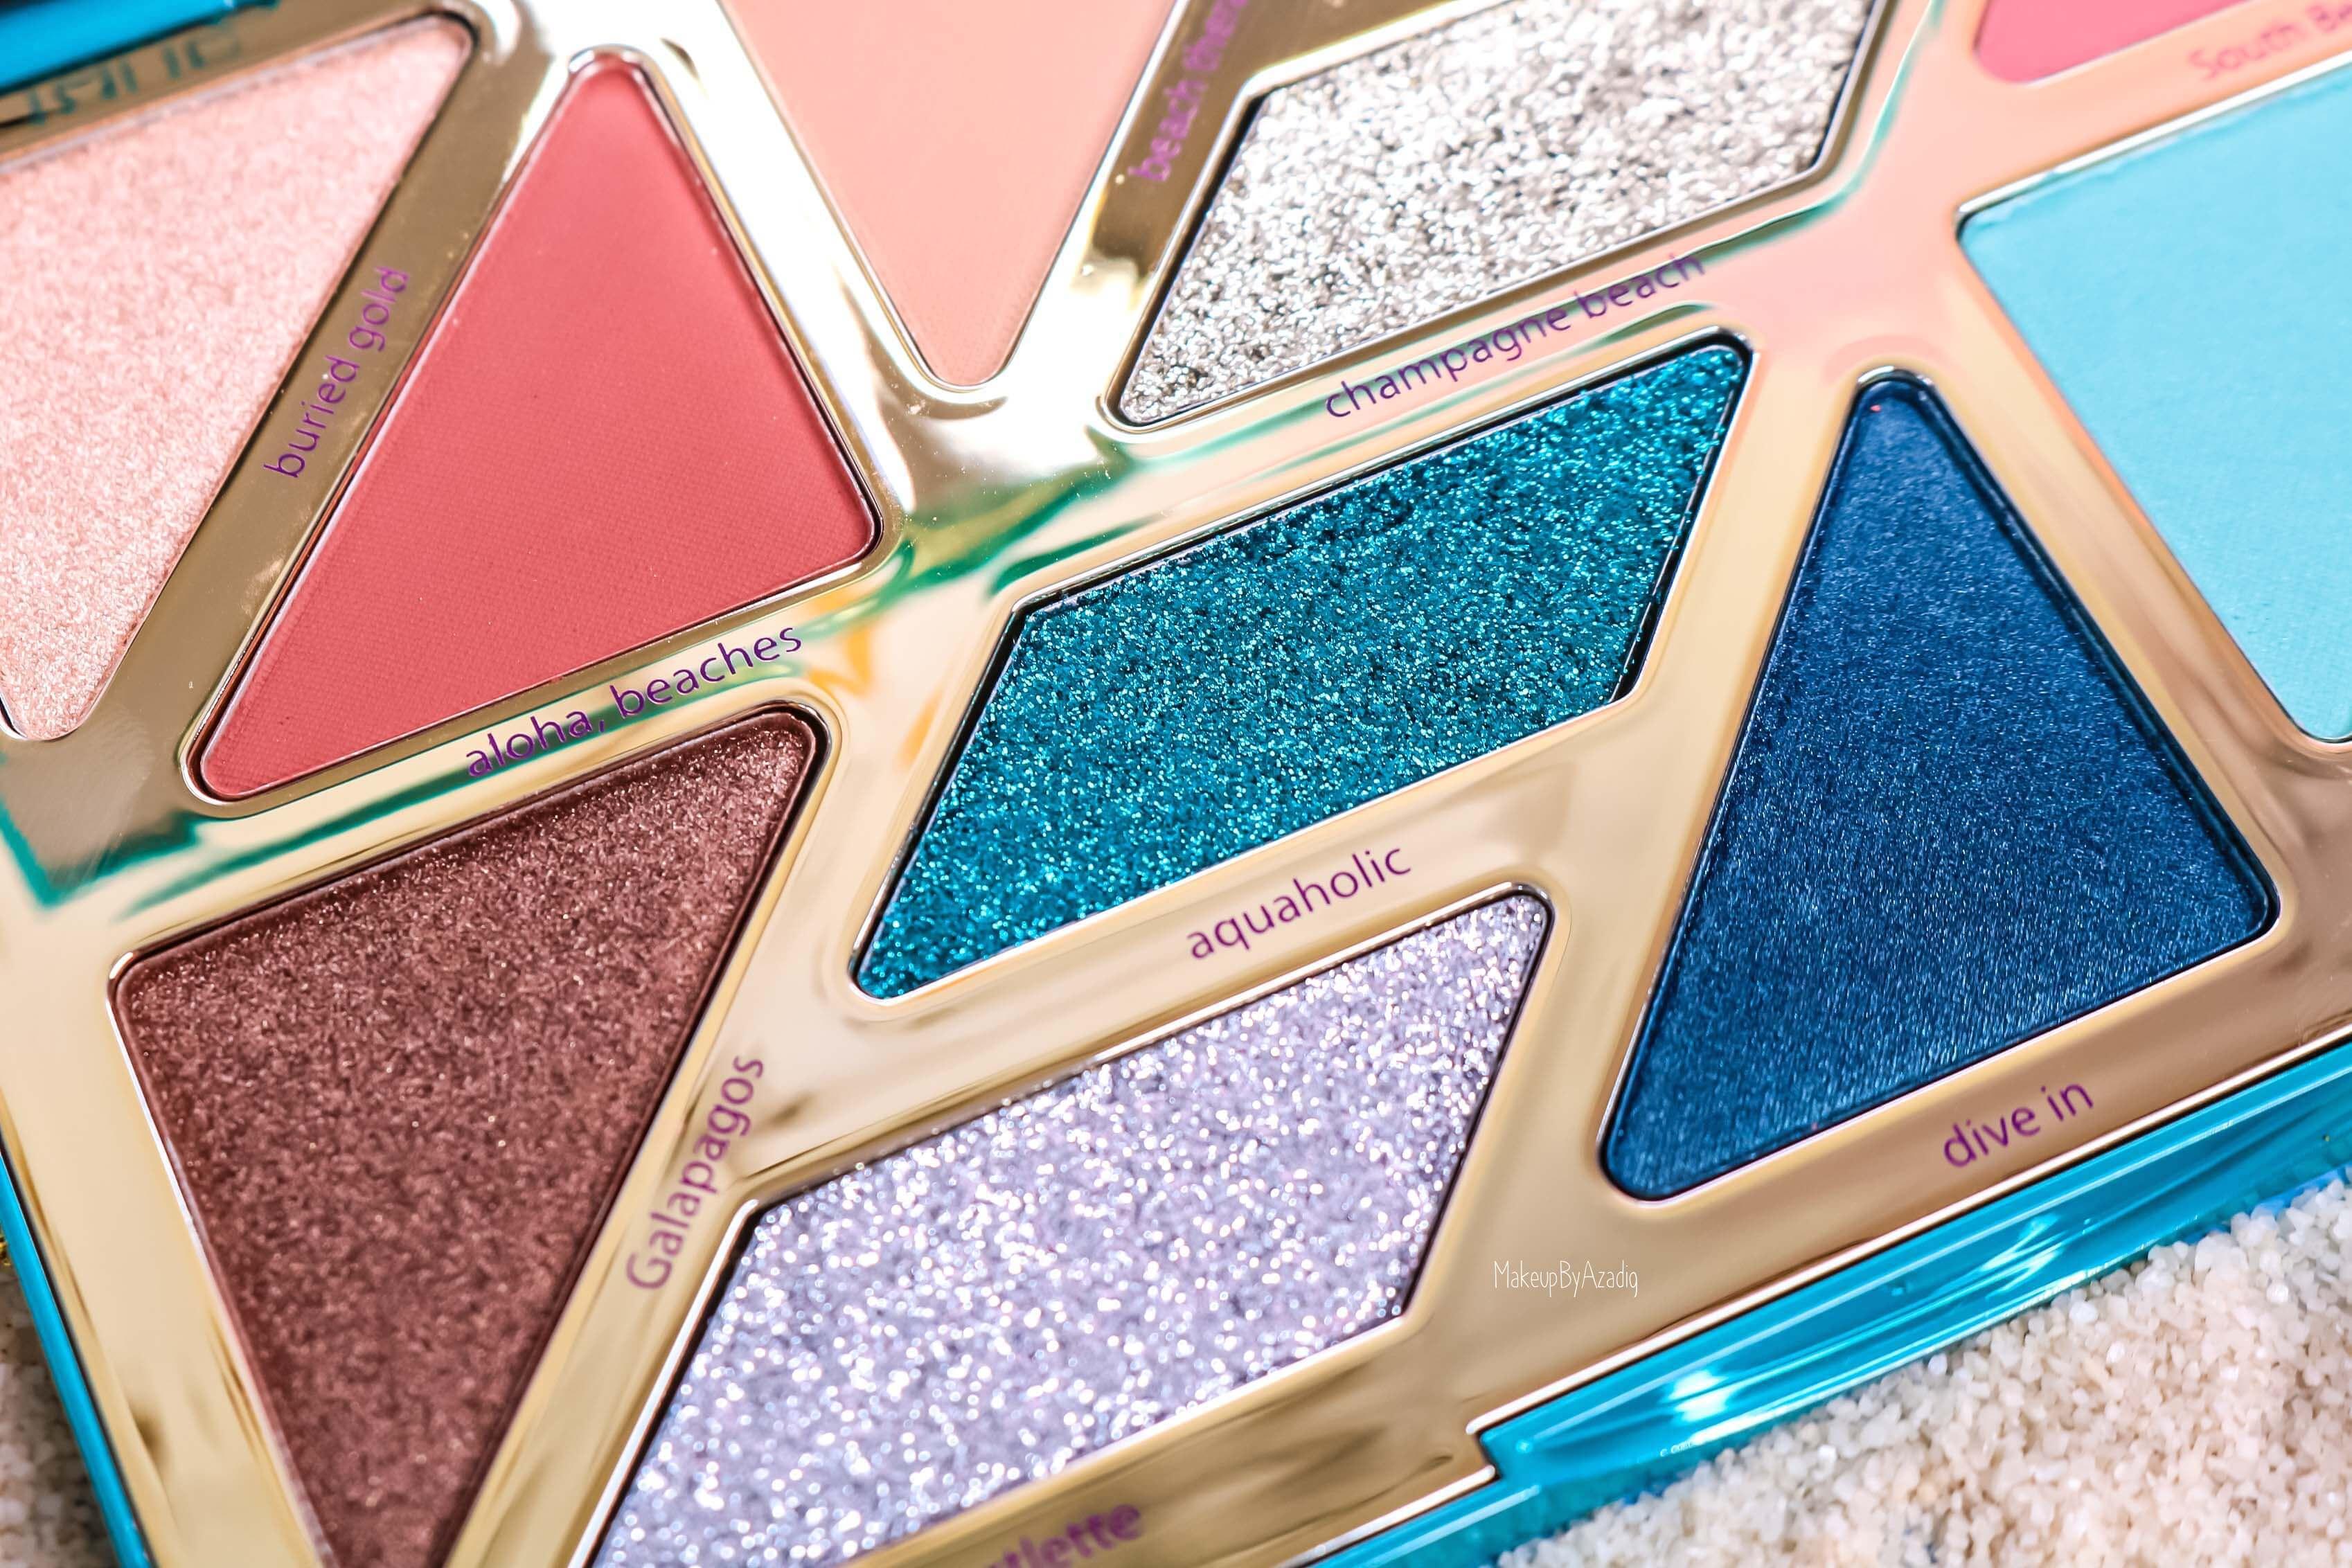 revue-palette-tarte-cosmetics-france-sephora-makeupbyazadig-swatch-prix-avis-rainforest-of-the-sea-pailettes